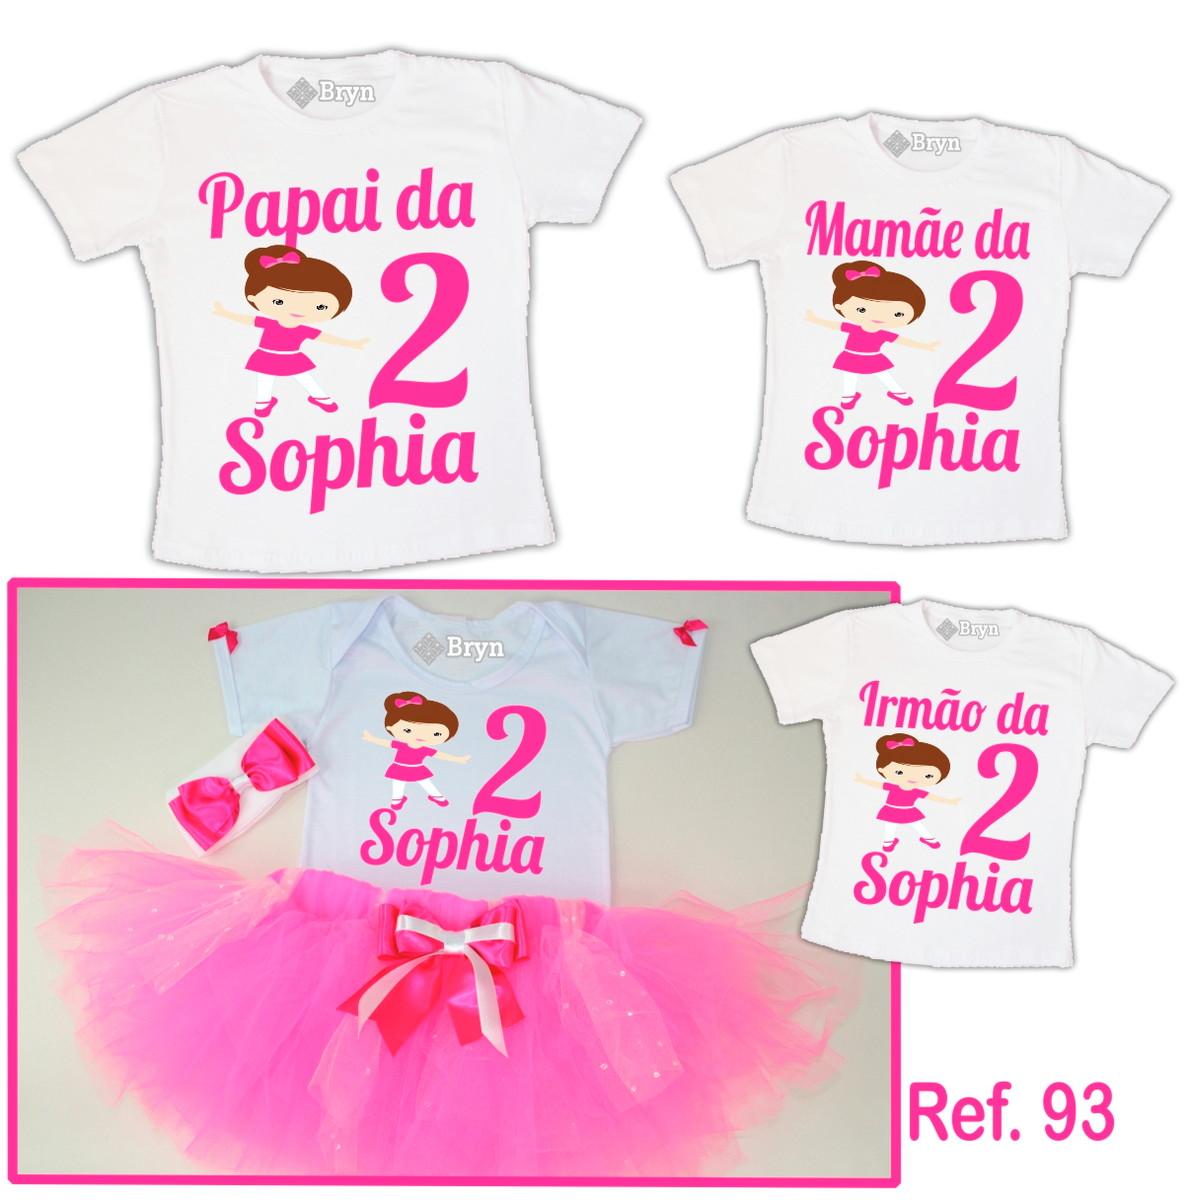 30d31aab20 Kit Fantasia Tutu Bailarina Rosa Pink + 3 Camisetas no Elo7